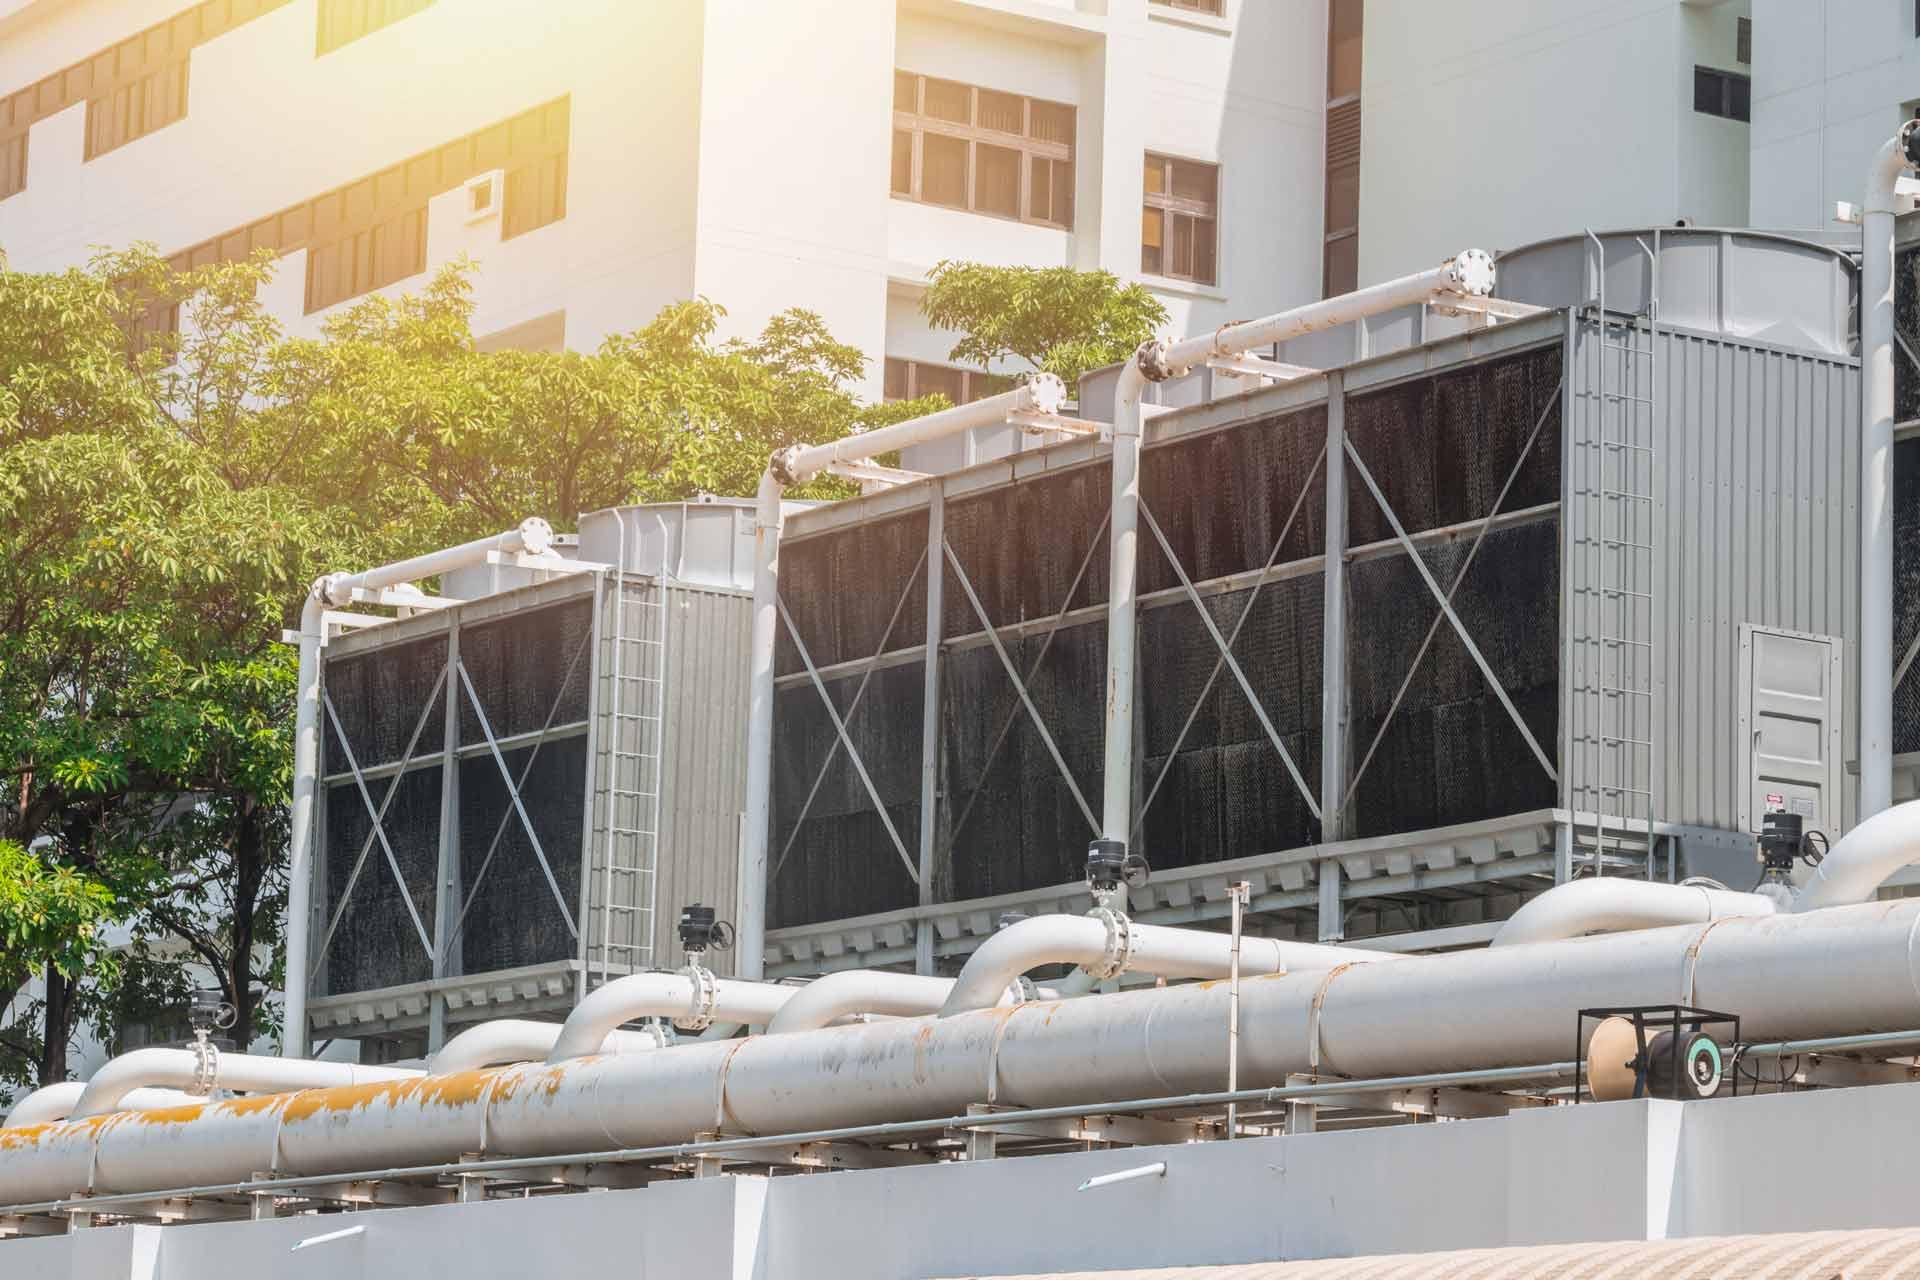 HVAC & Refrigeration